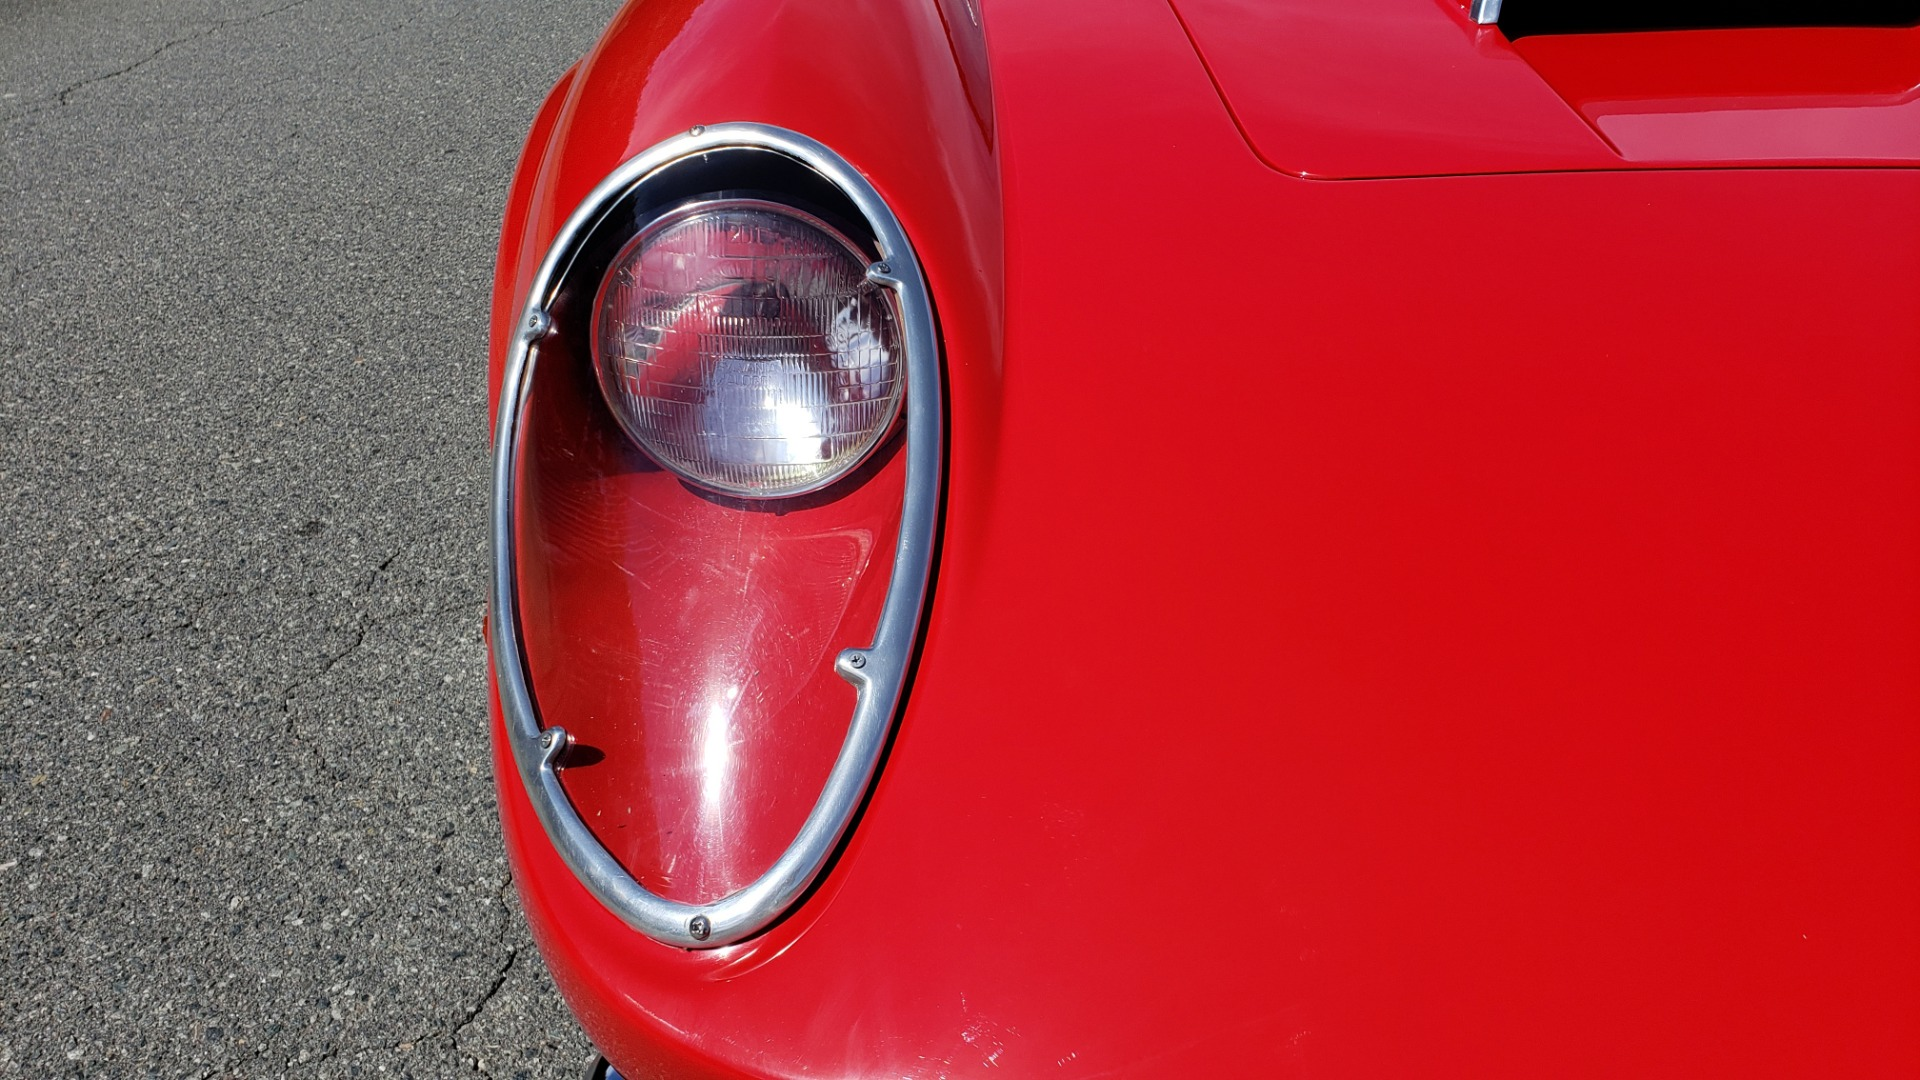 Used 1961 Ferrari 250GT SWB CALIFORNIA REPLICA / 302CI V8 / TREMEC 5-SPEED for sale Sold at Formula Imports in Charlotte NC 28227 27